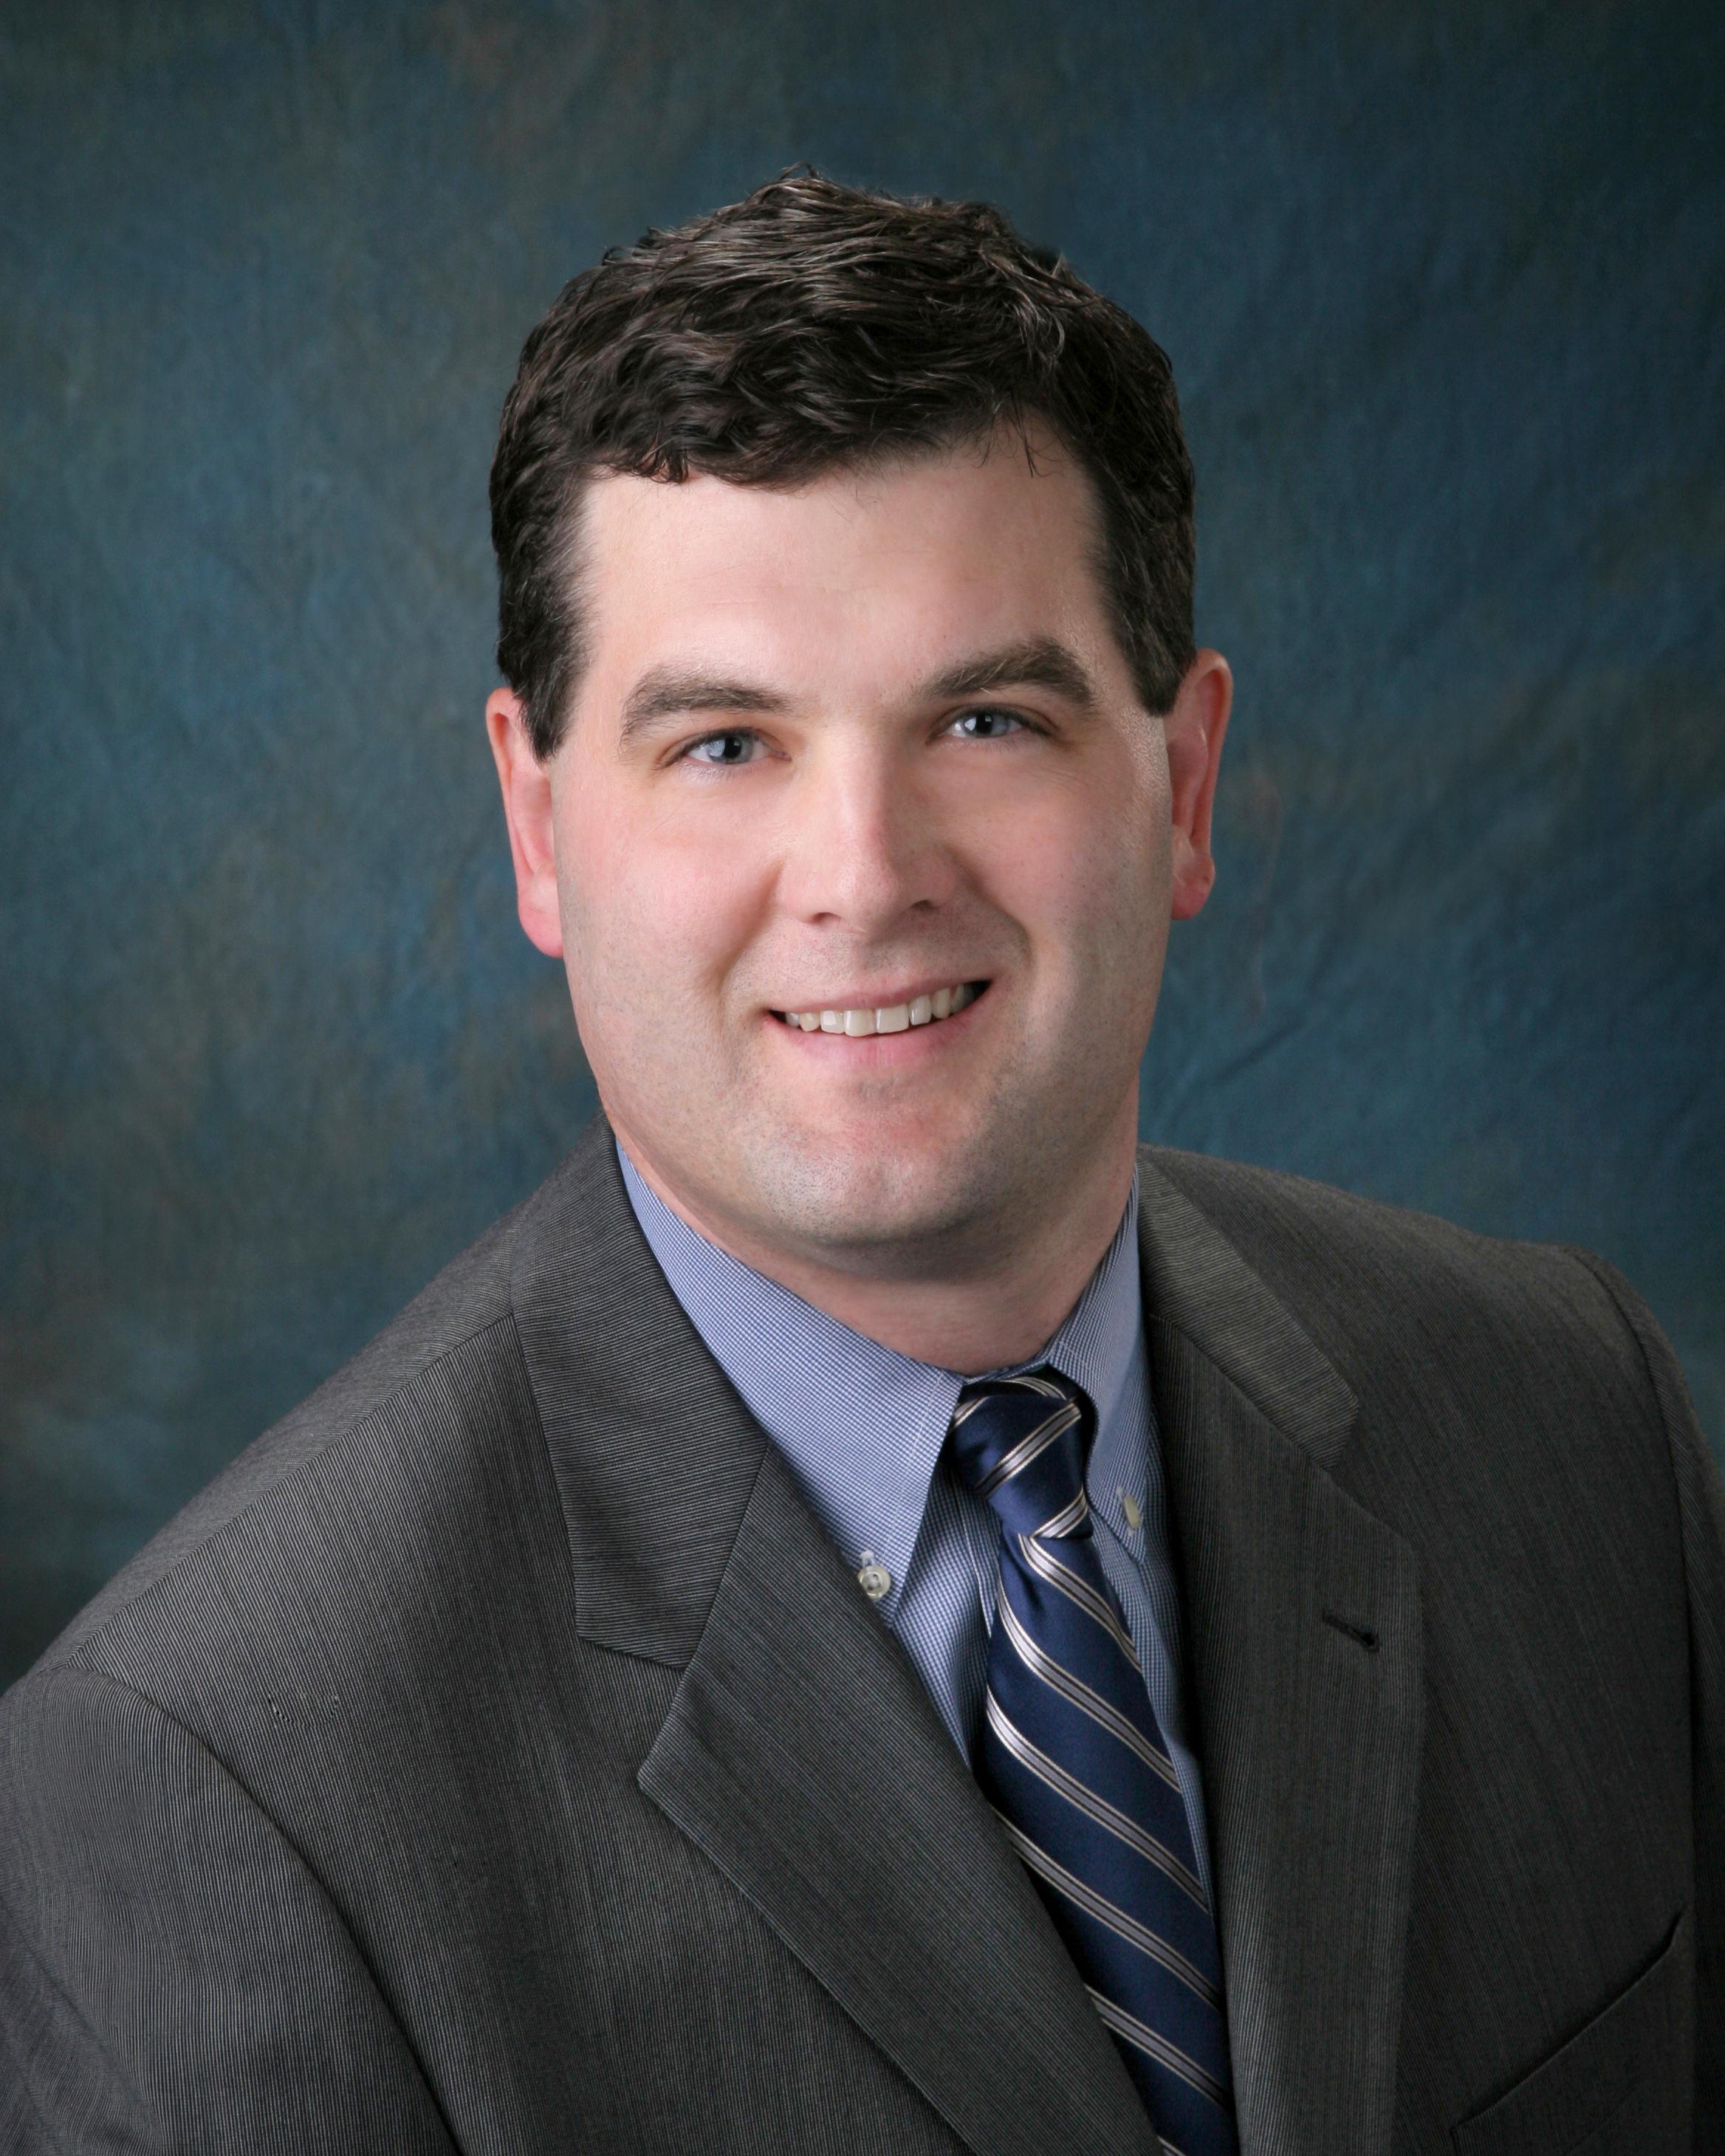 Bradley Coots, MD